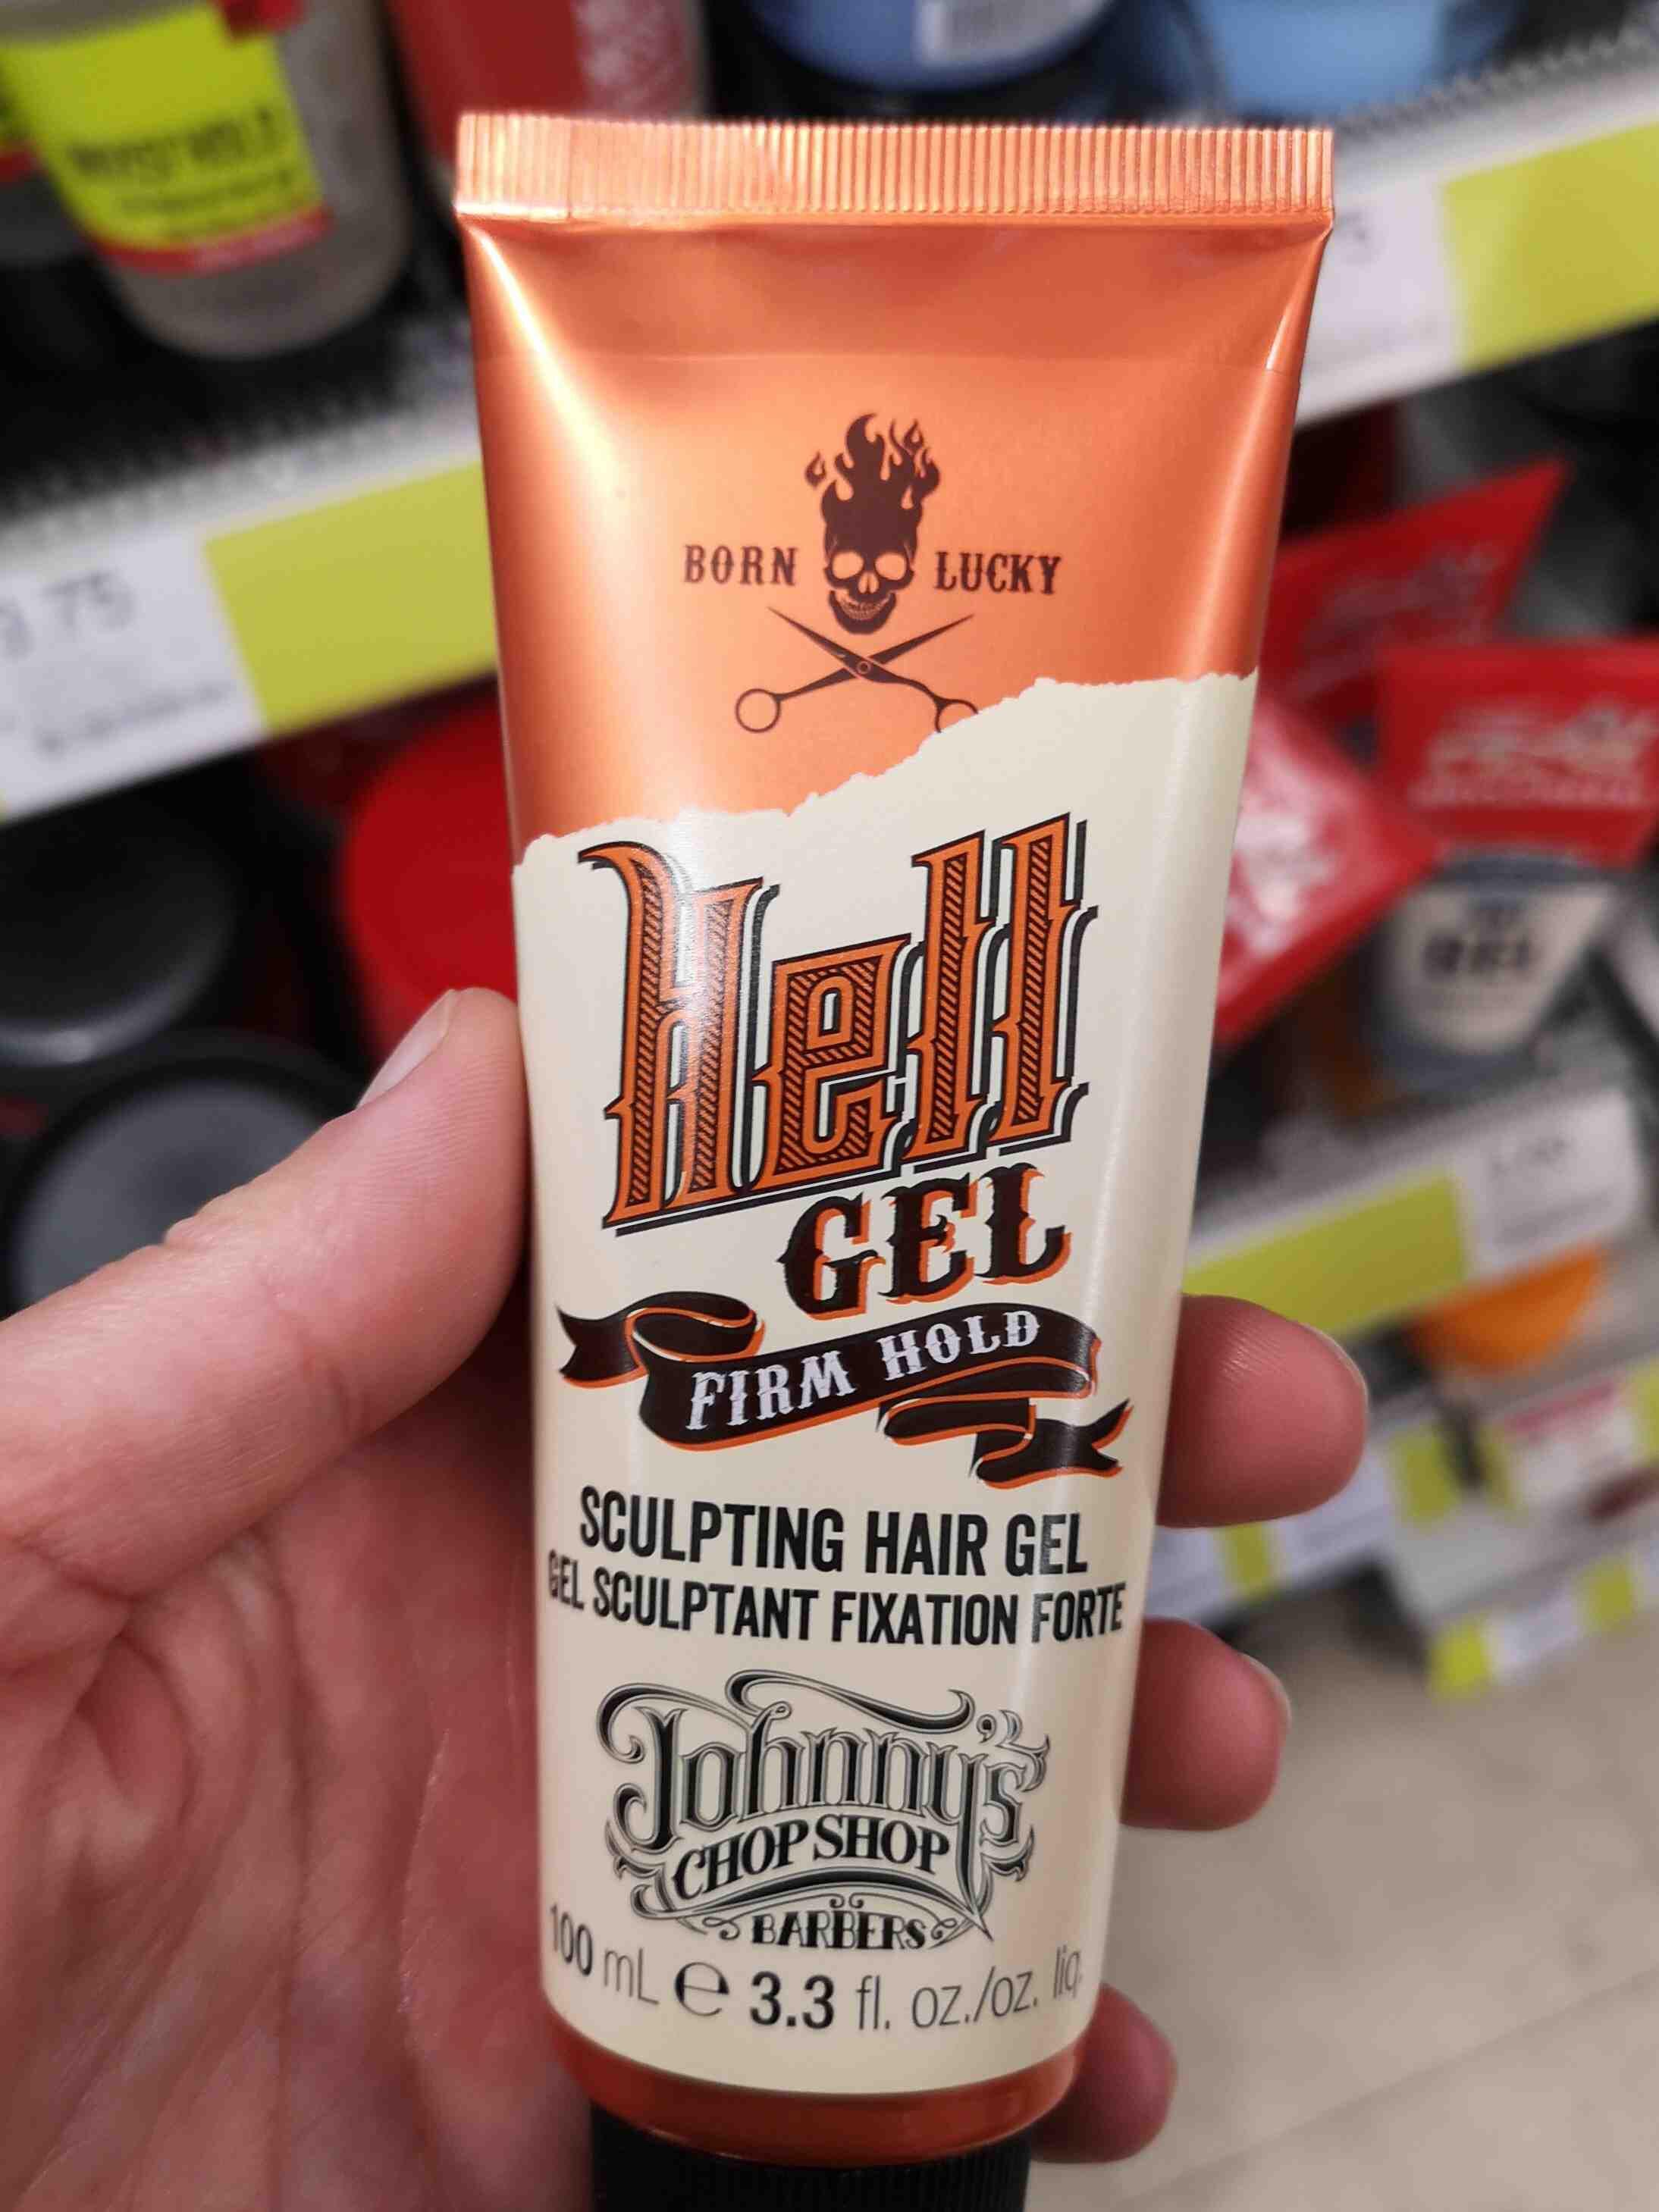 Born lucky hell gel - Product - en